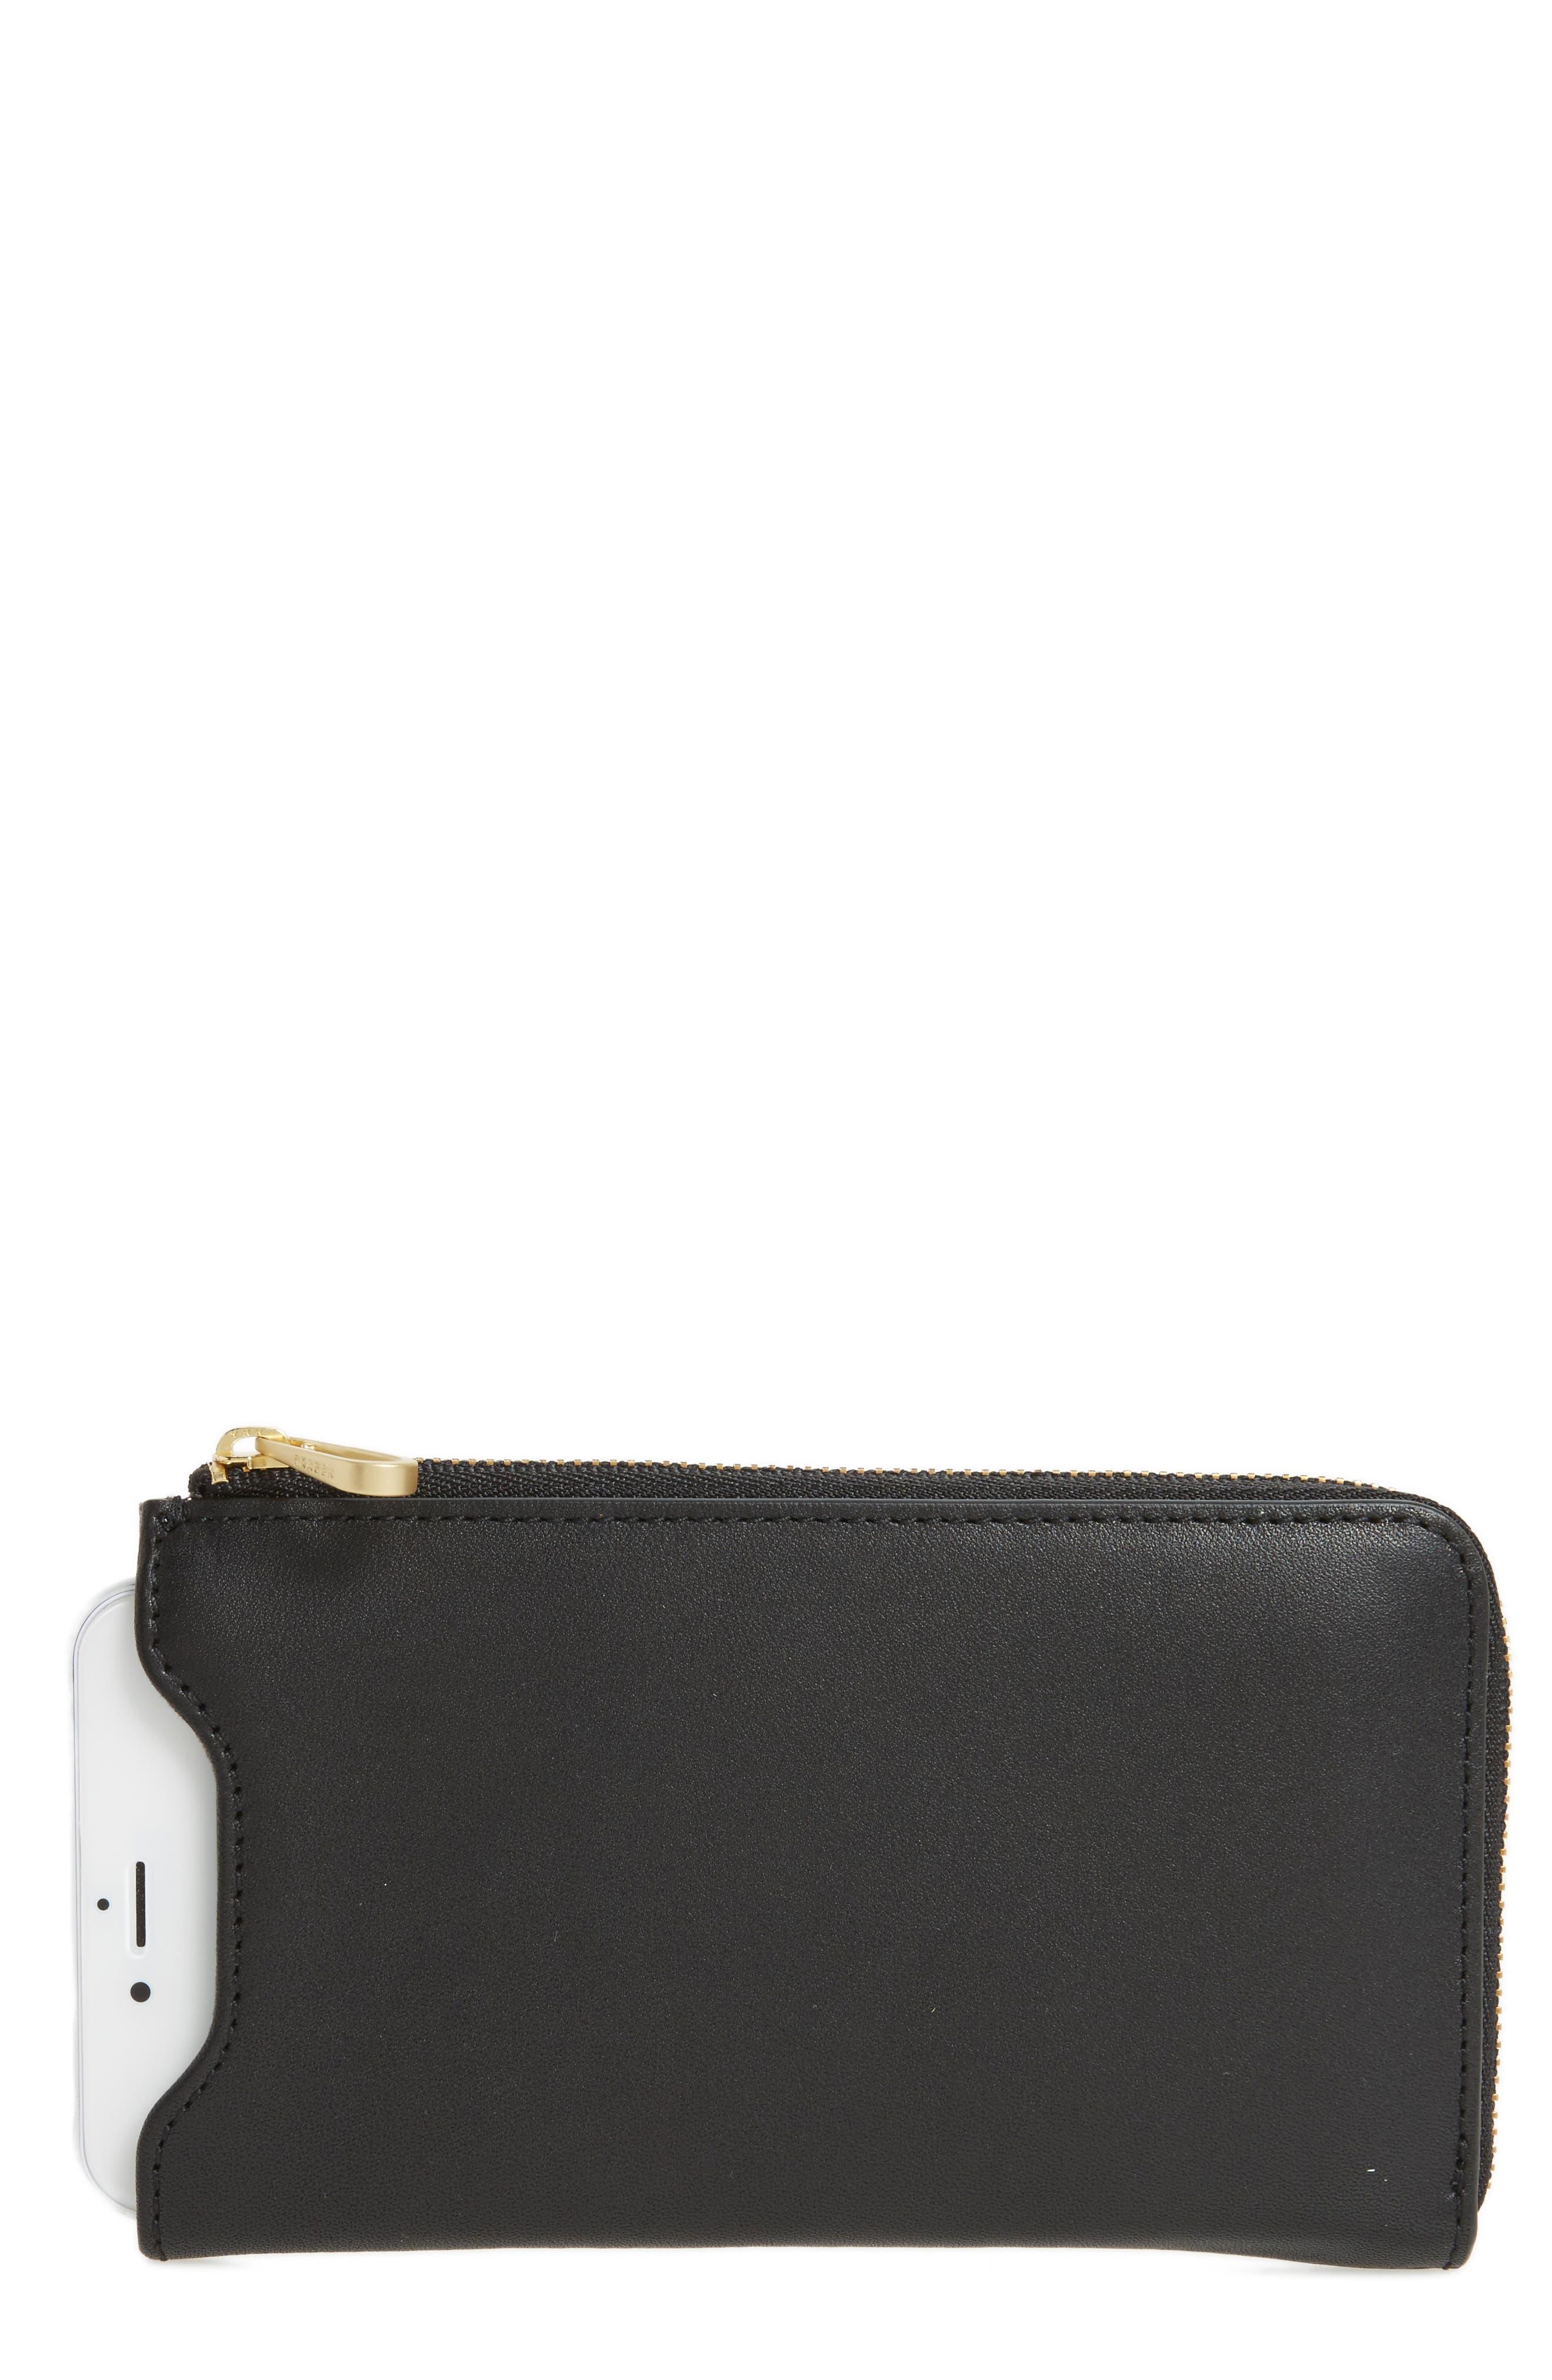 Skagen Lilli iPhone 6/6s/7 Leather Sleeve